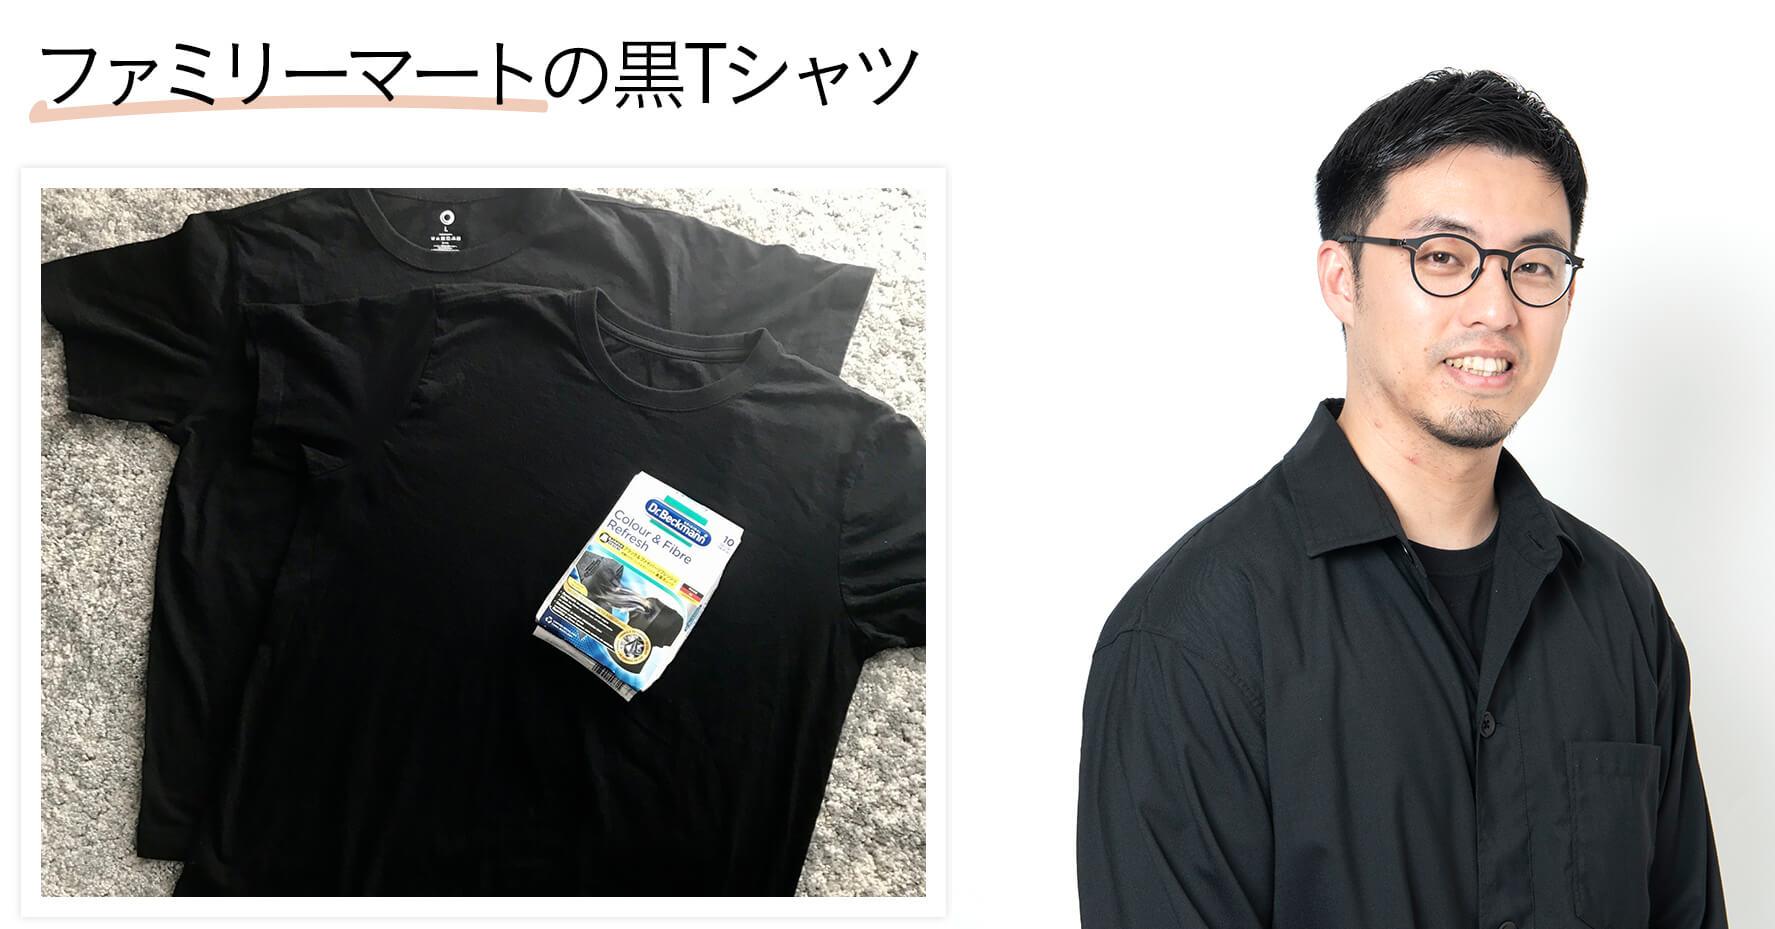 Nやすお気に入りのファミリーマートの黒Tシャツ